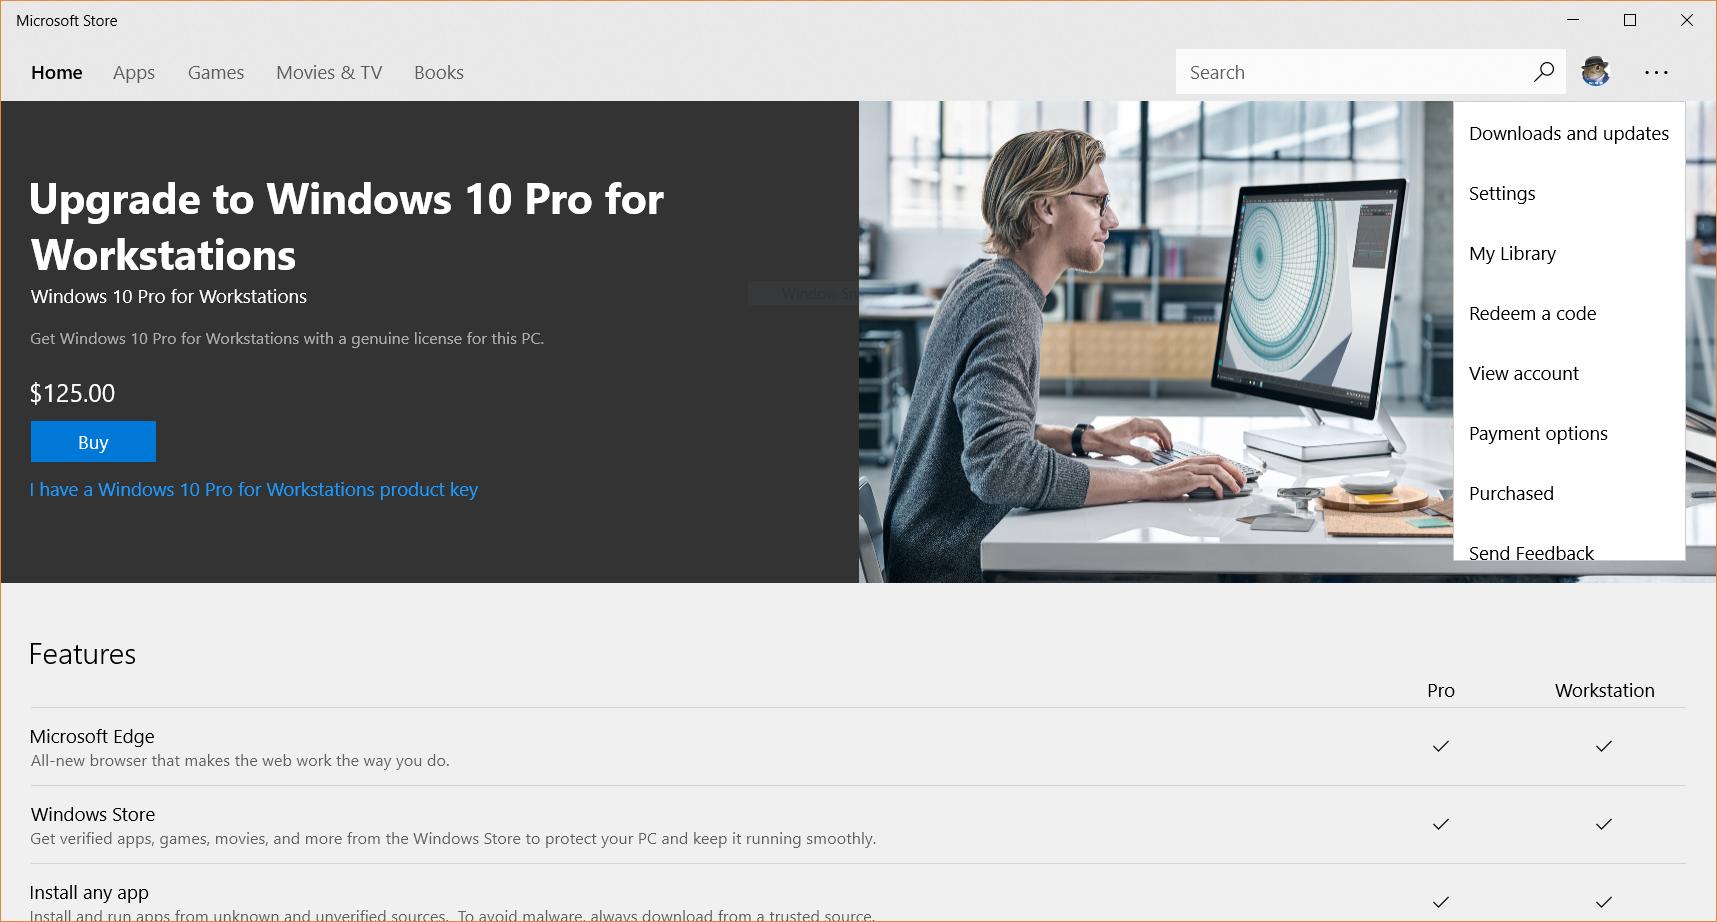 Windows 10 Pro for Workstations - Microsoft Community